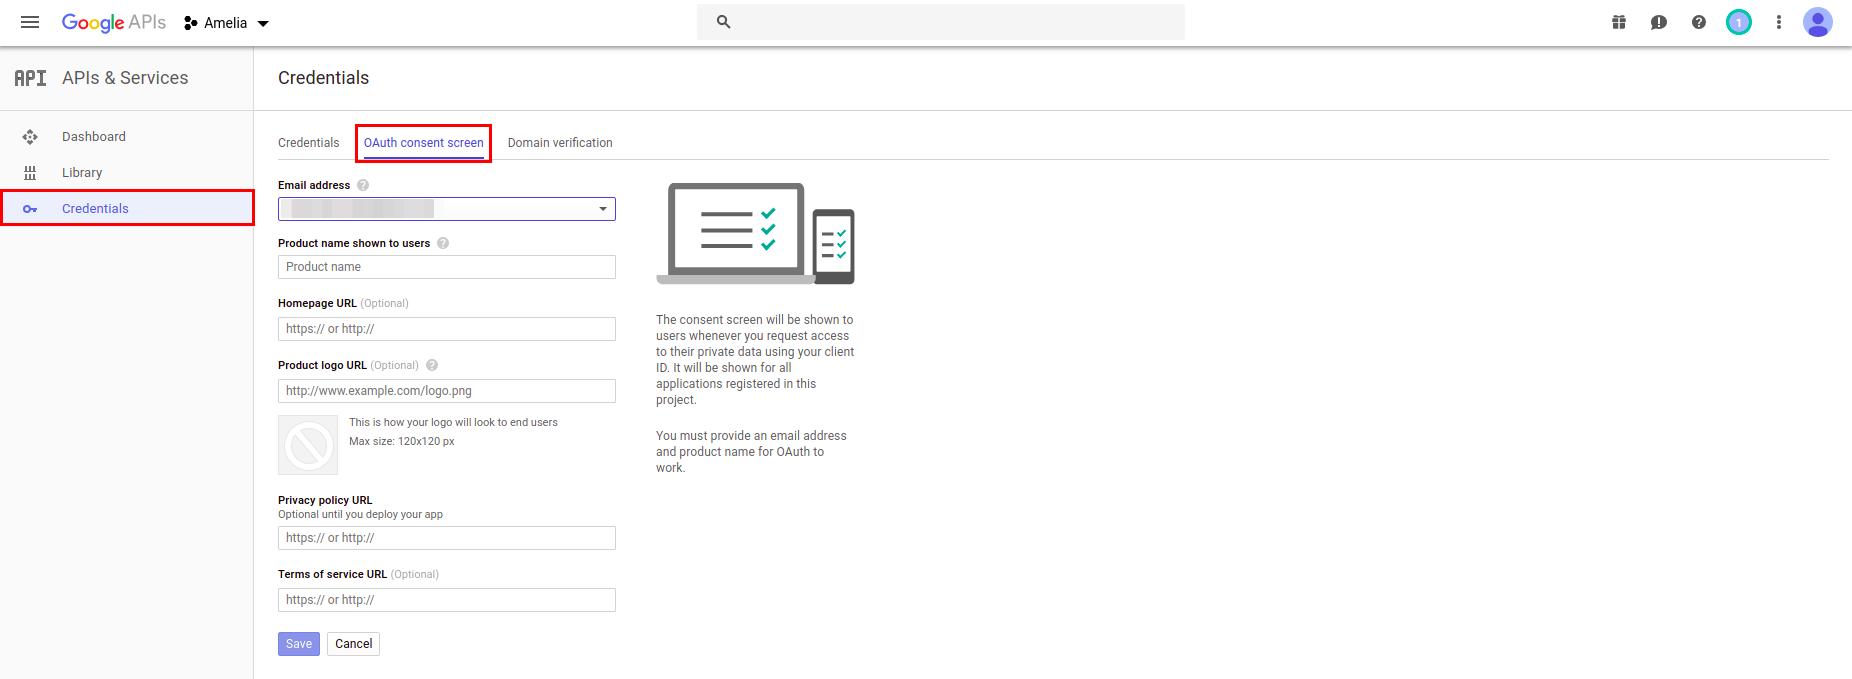 Amelia Booking Google Calendar Integration